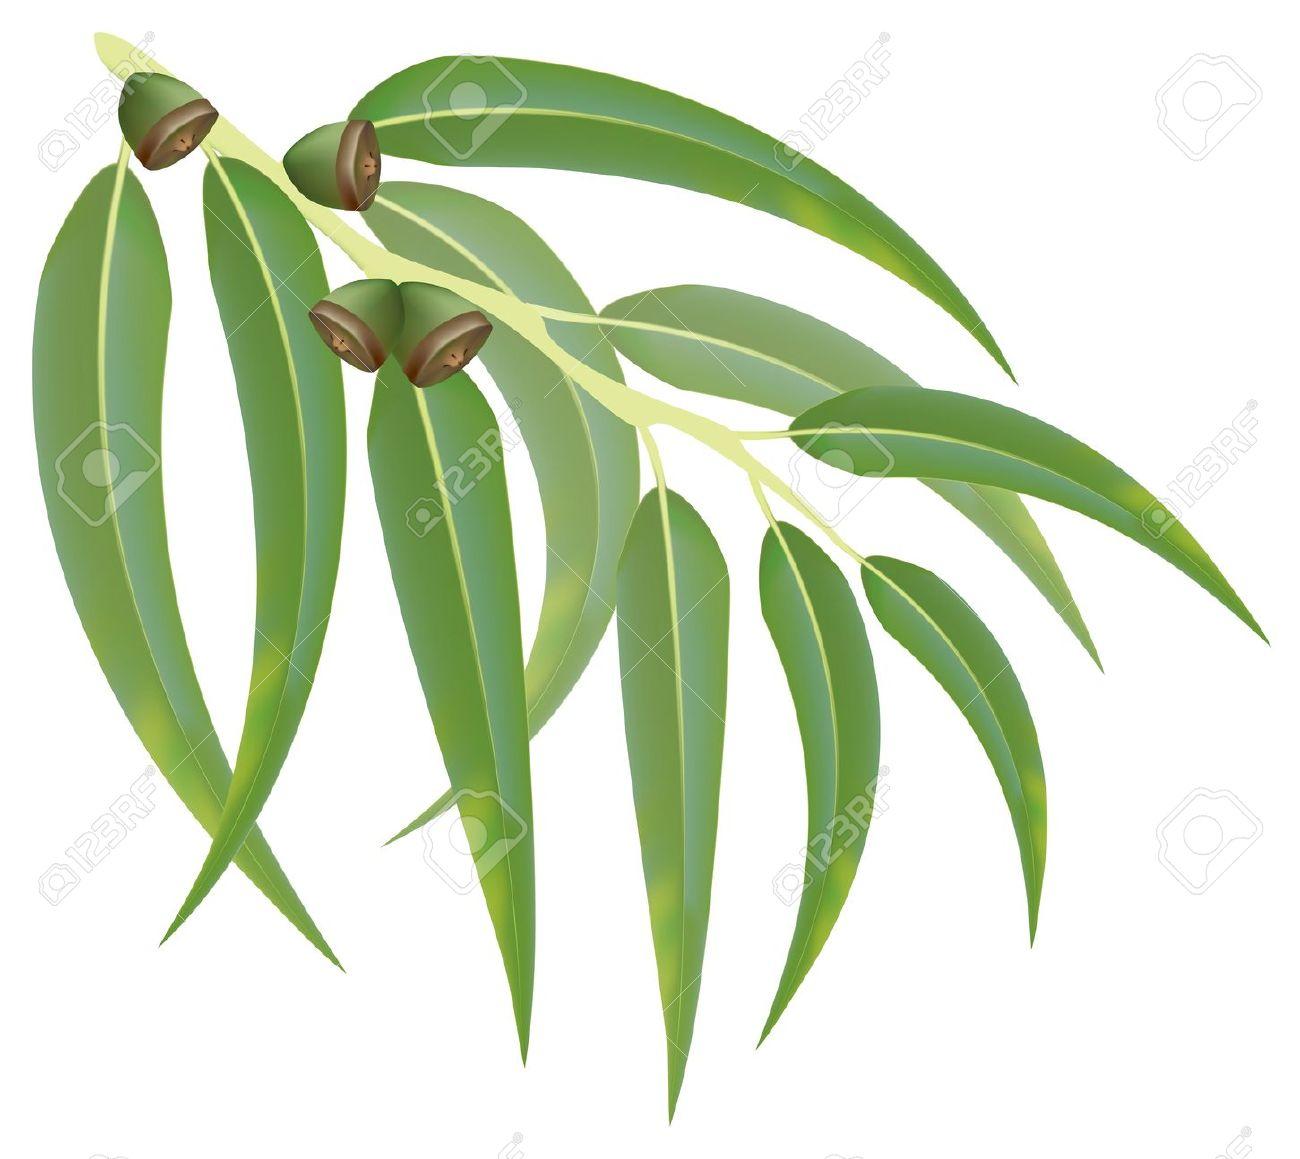 424 Eucalyptus free clipart.